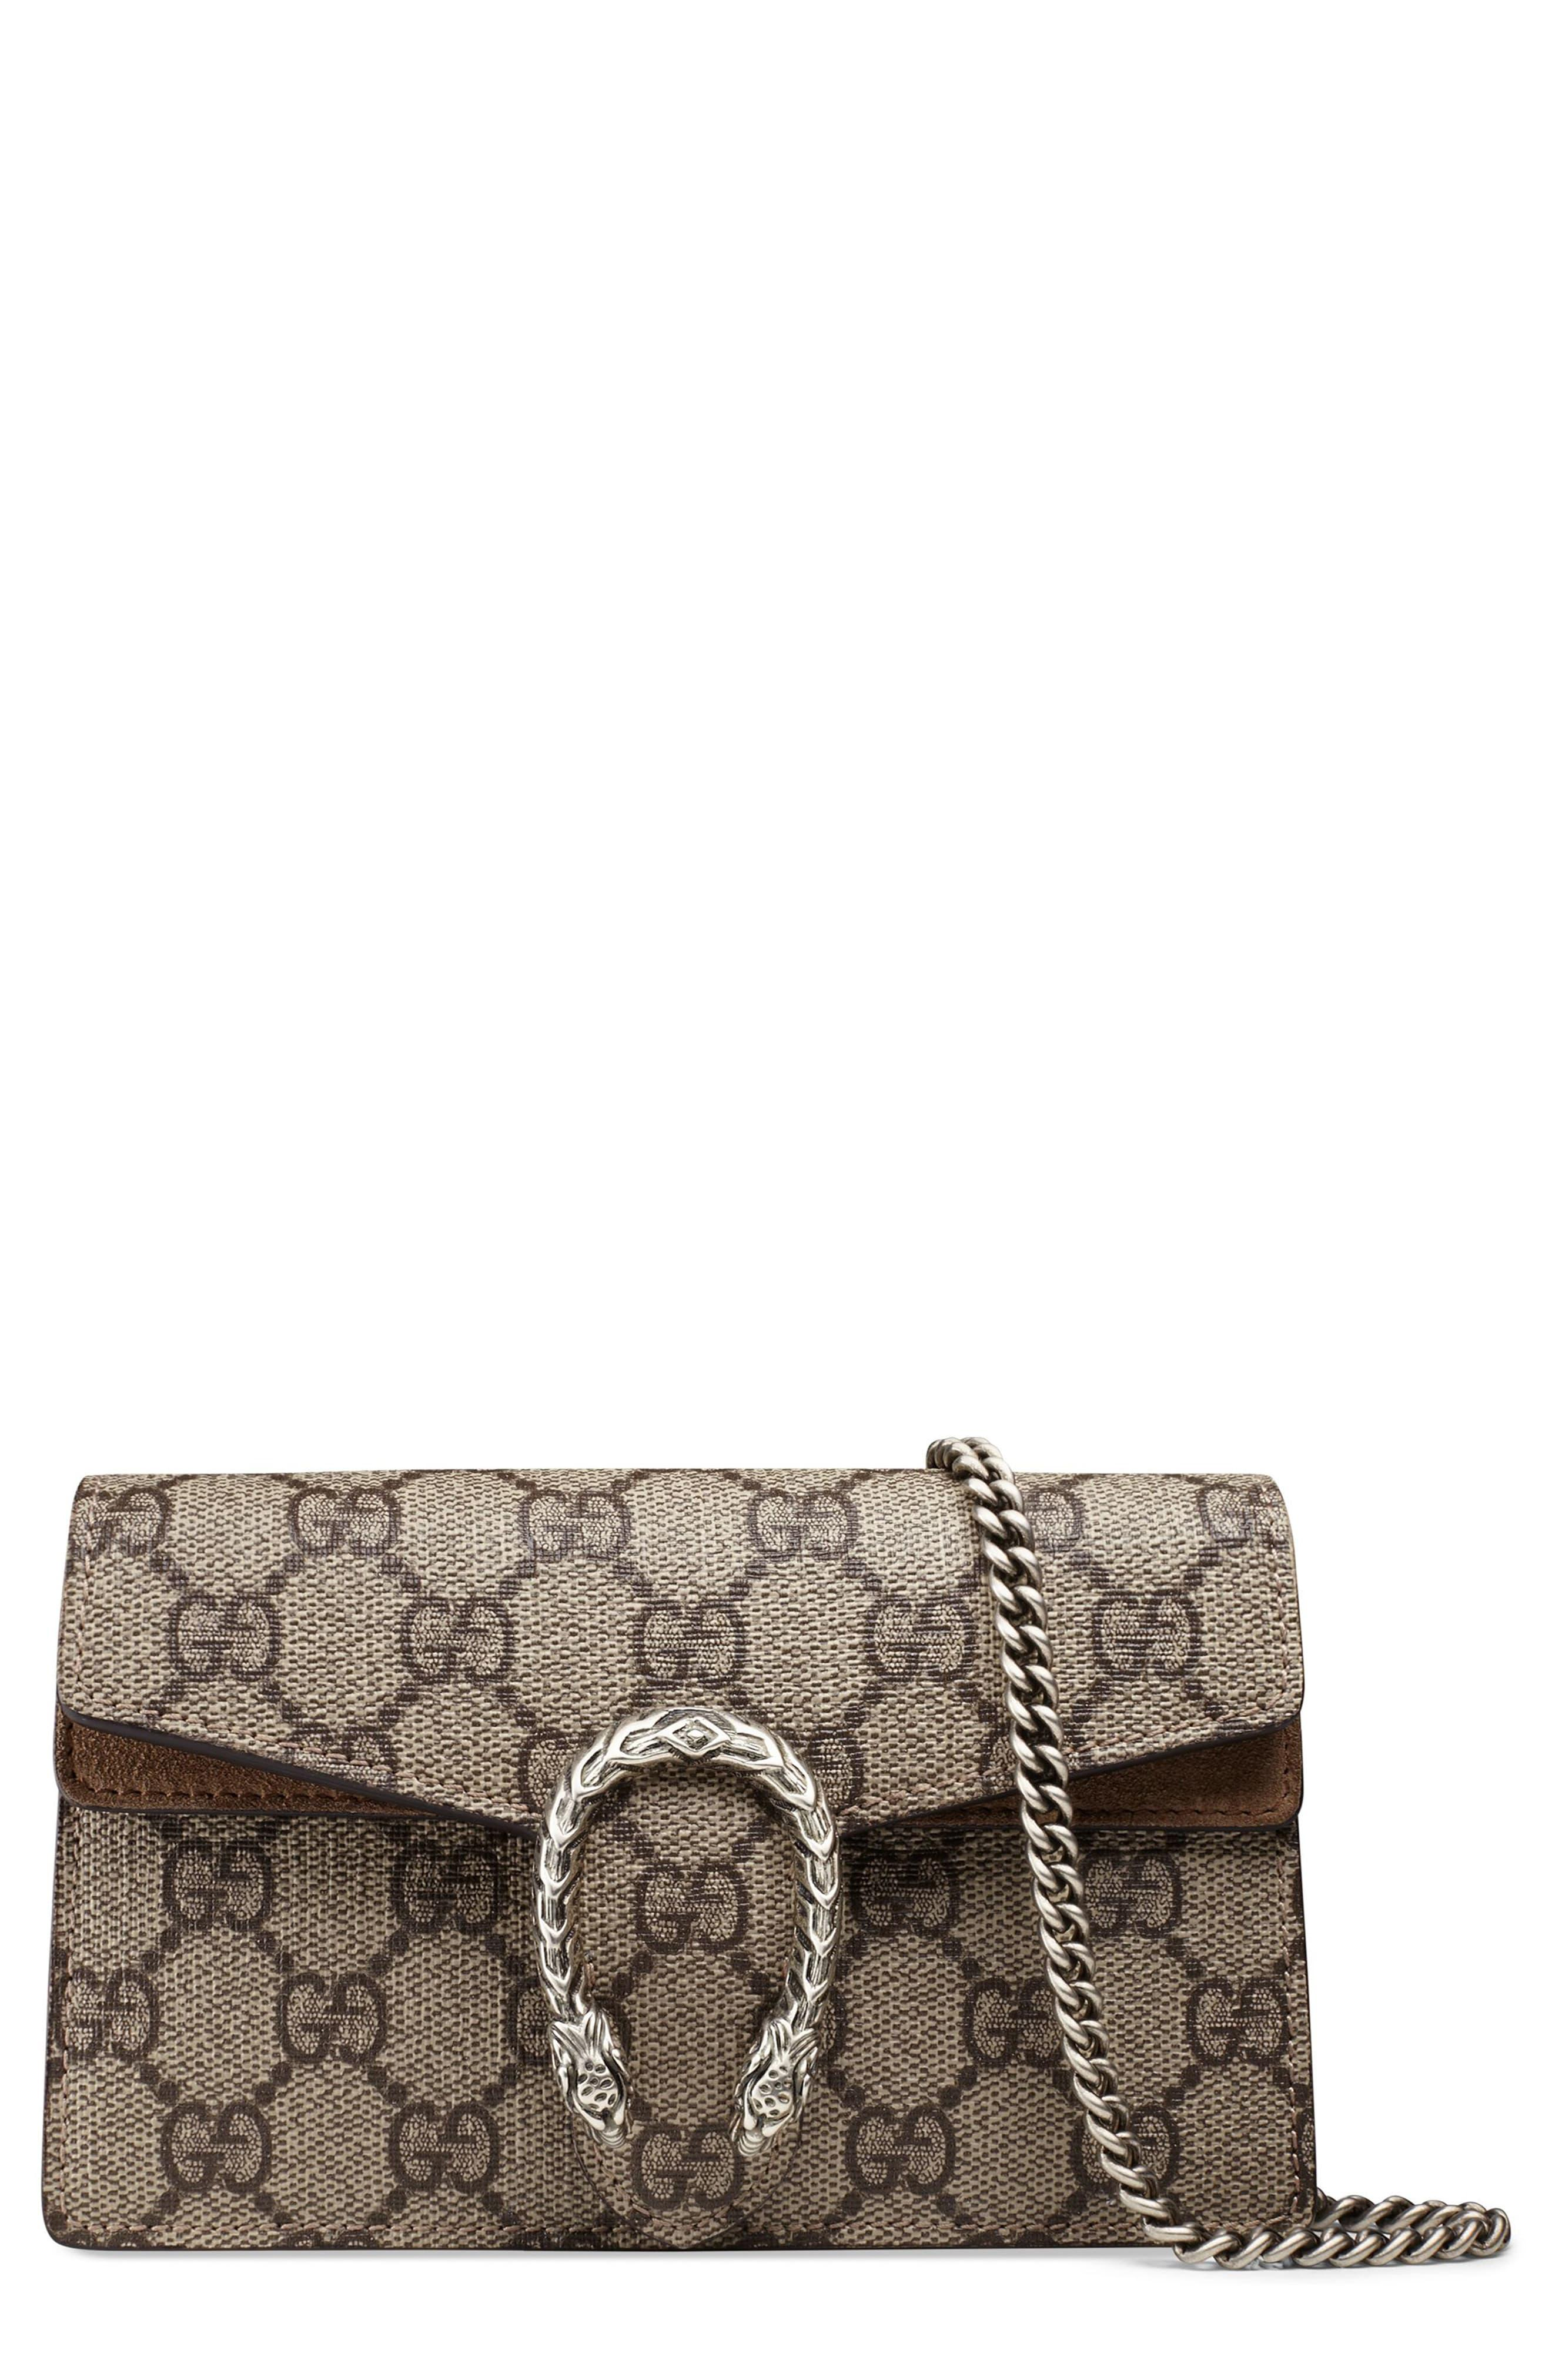 908e23eae9 Gucci - Natural Super Mini Dionysus Gg Supreme Canvas & Suede Shoulder Bag  - Lyst. View fullscreen